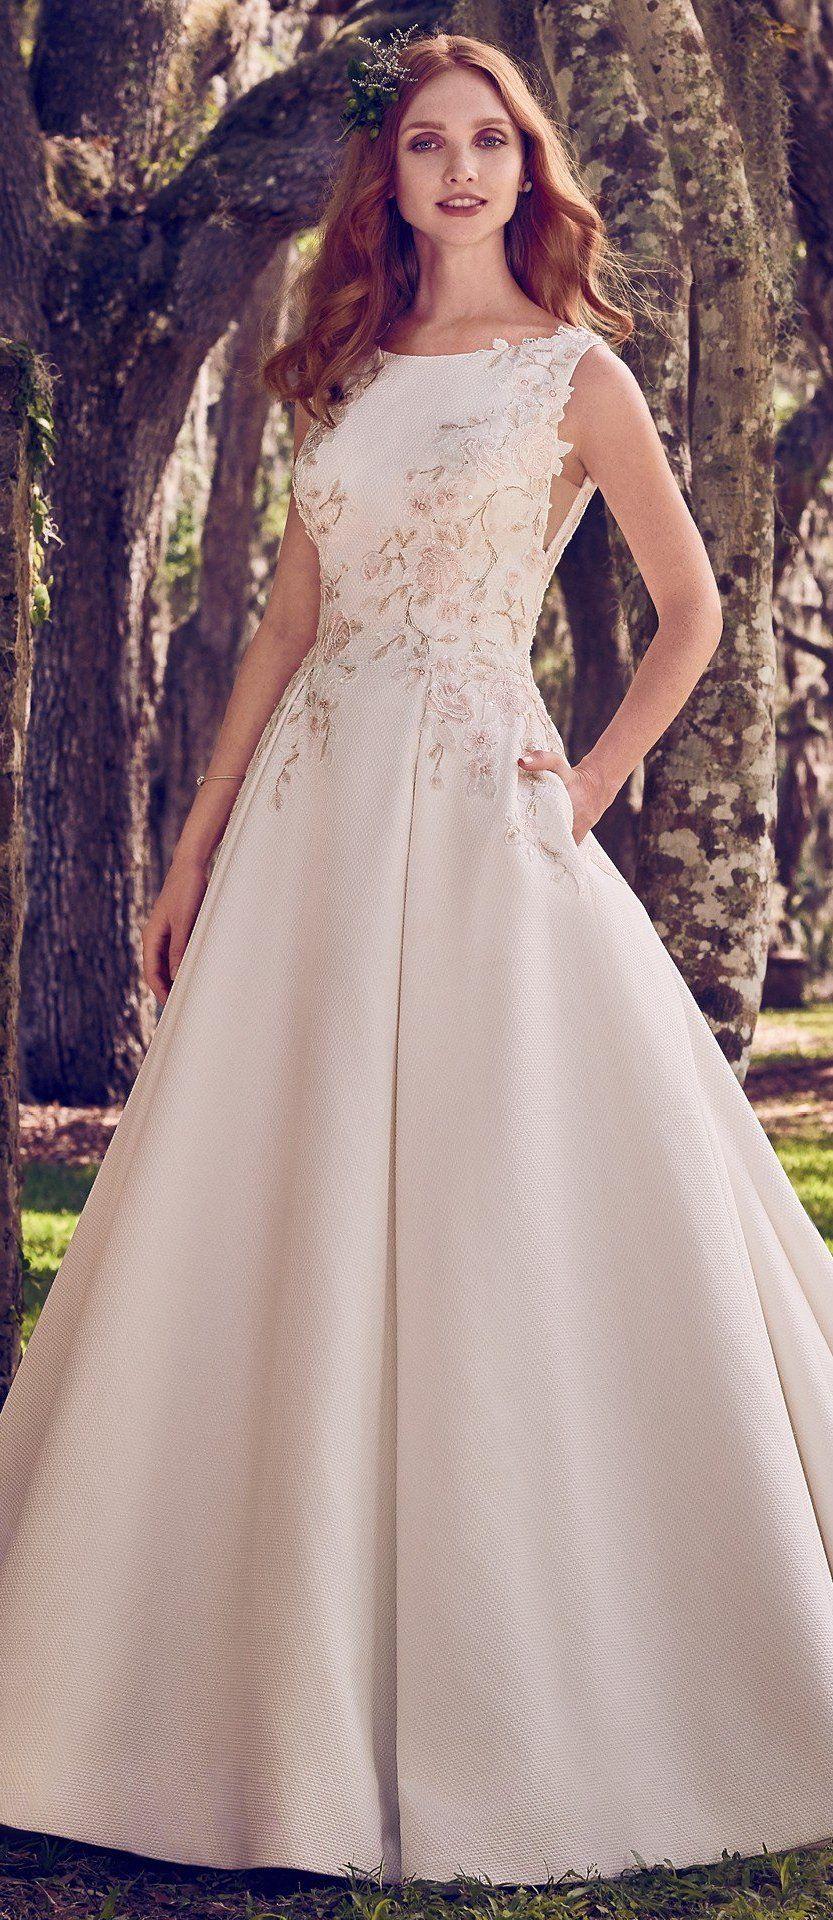 Wedding Dresses Bridal Gowns Jcpenney Wedding Dresses Wedding Dresses Sottero And Midgley Wedding Dresses [ 1920 x 833 Pixel ]